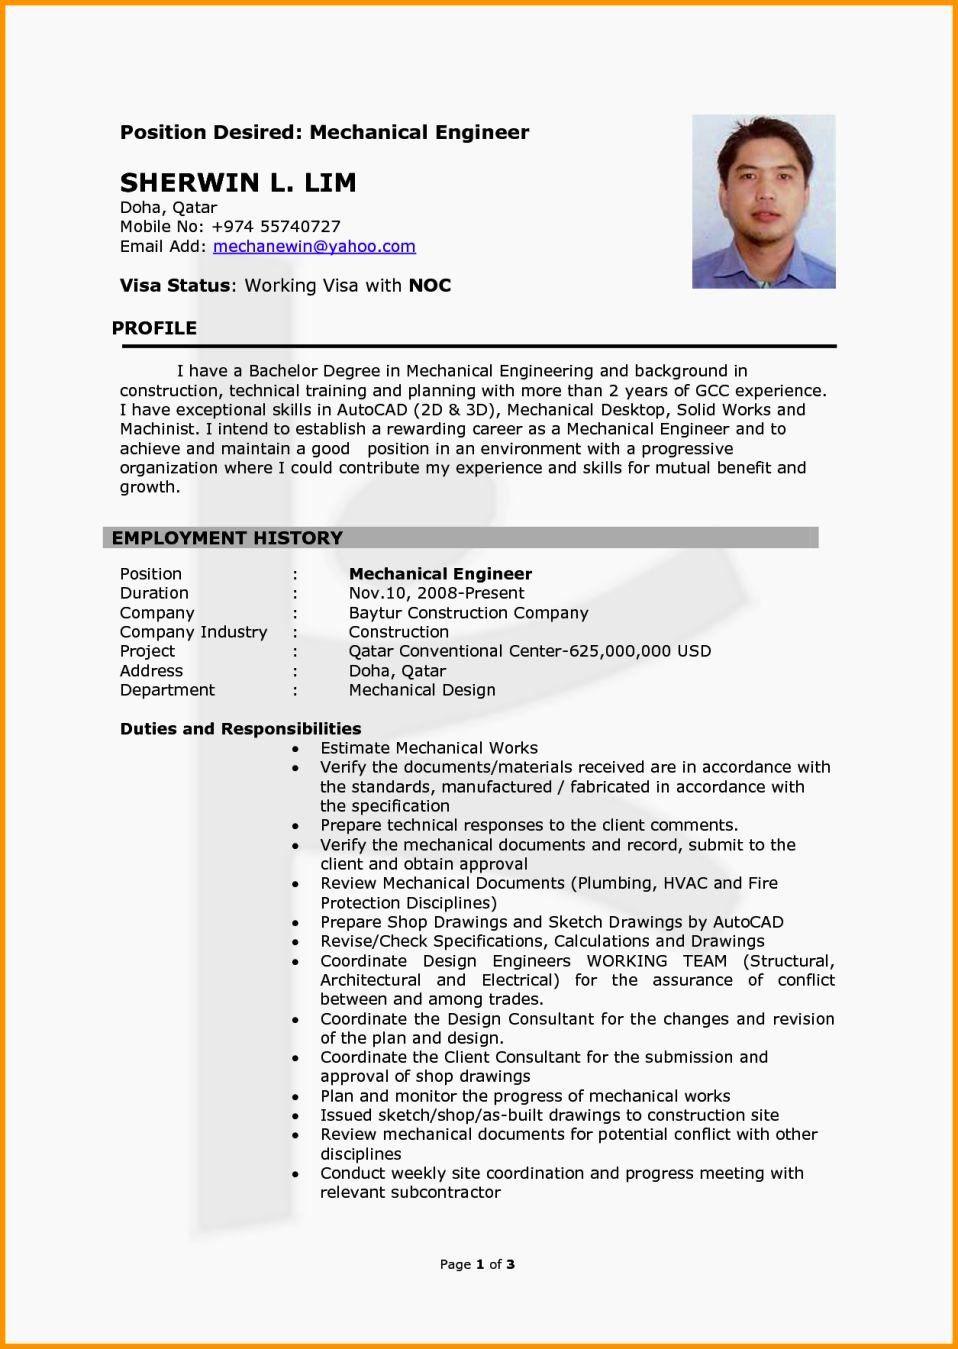 25 mechanical engineer resume templates in 2020